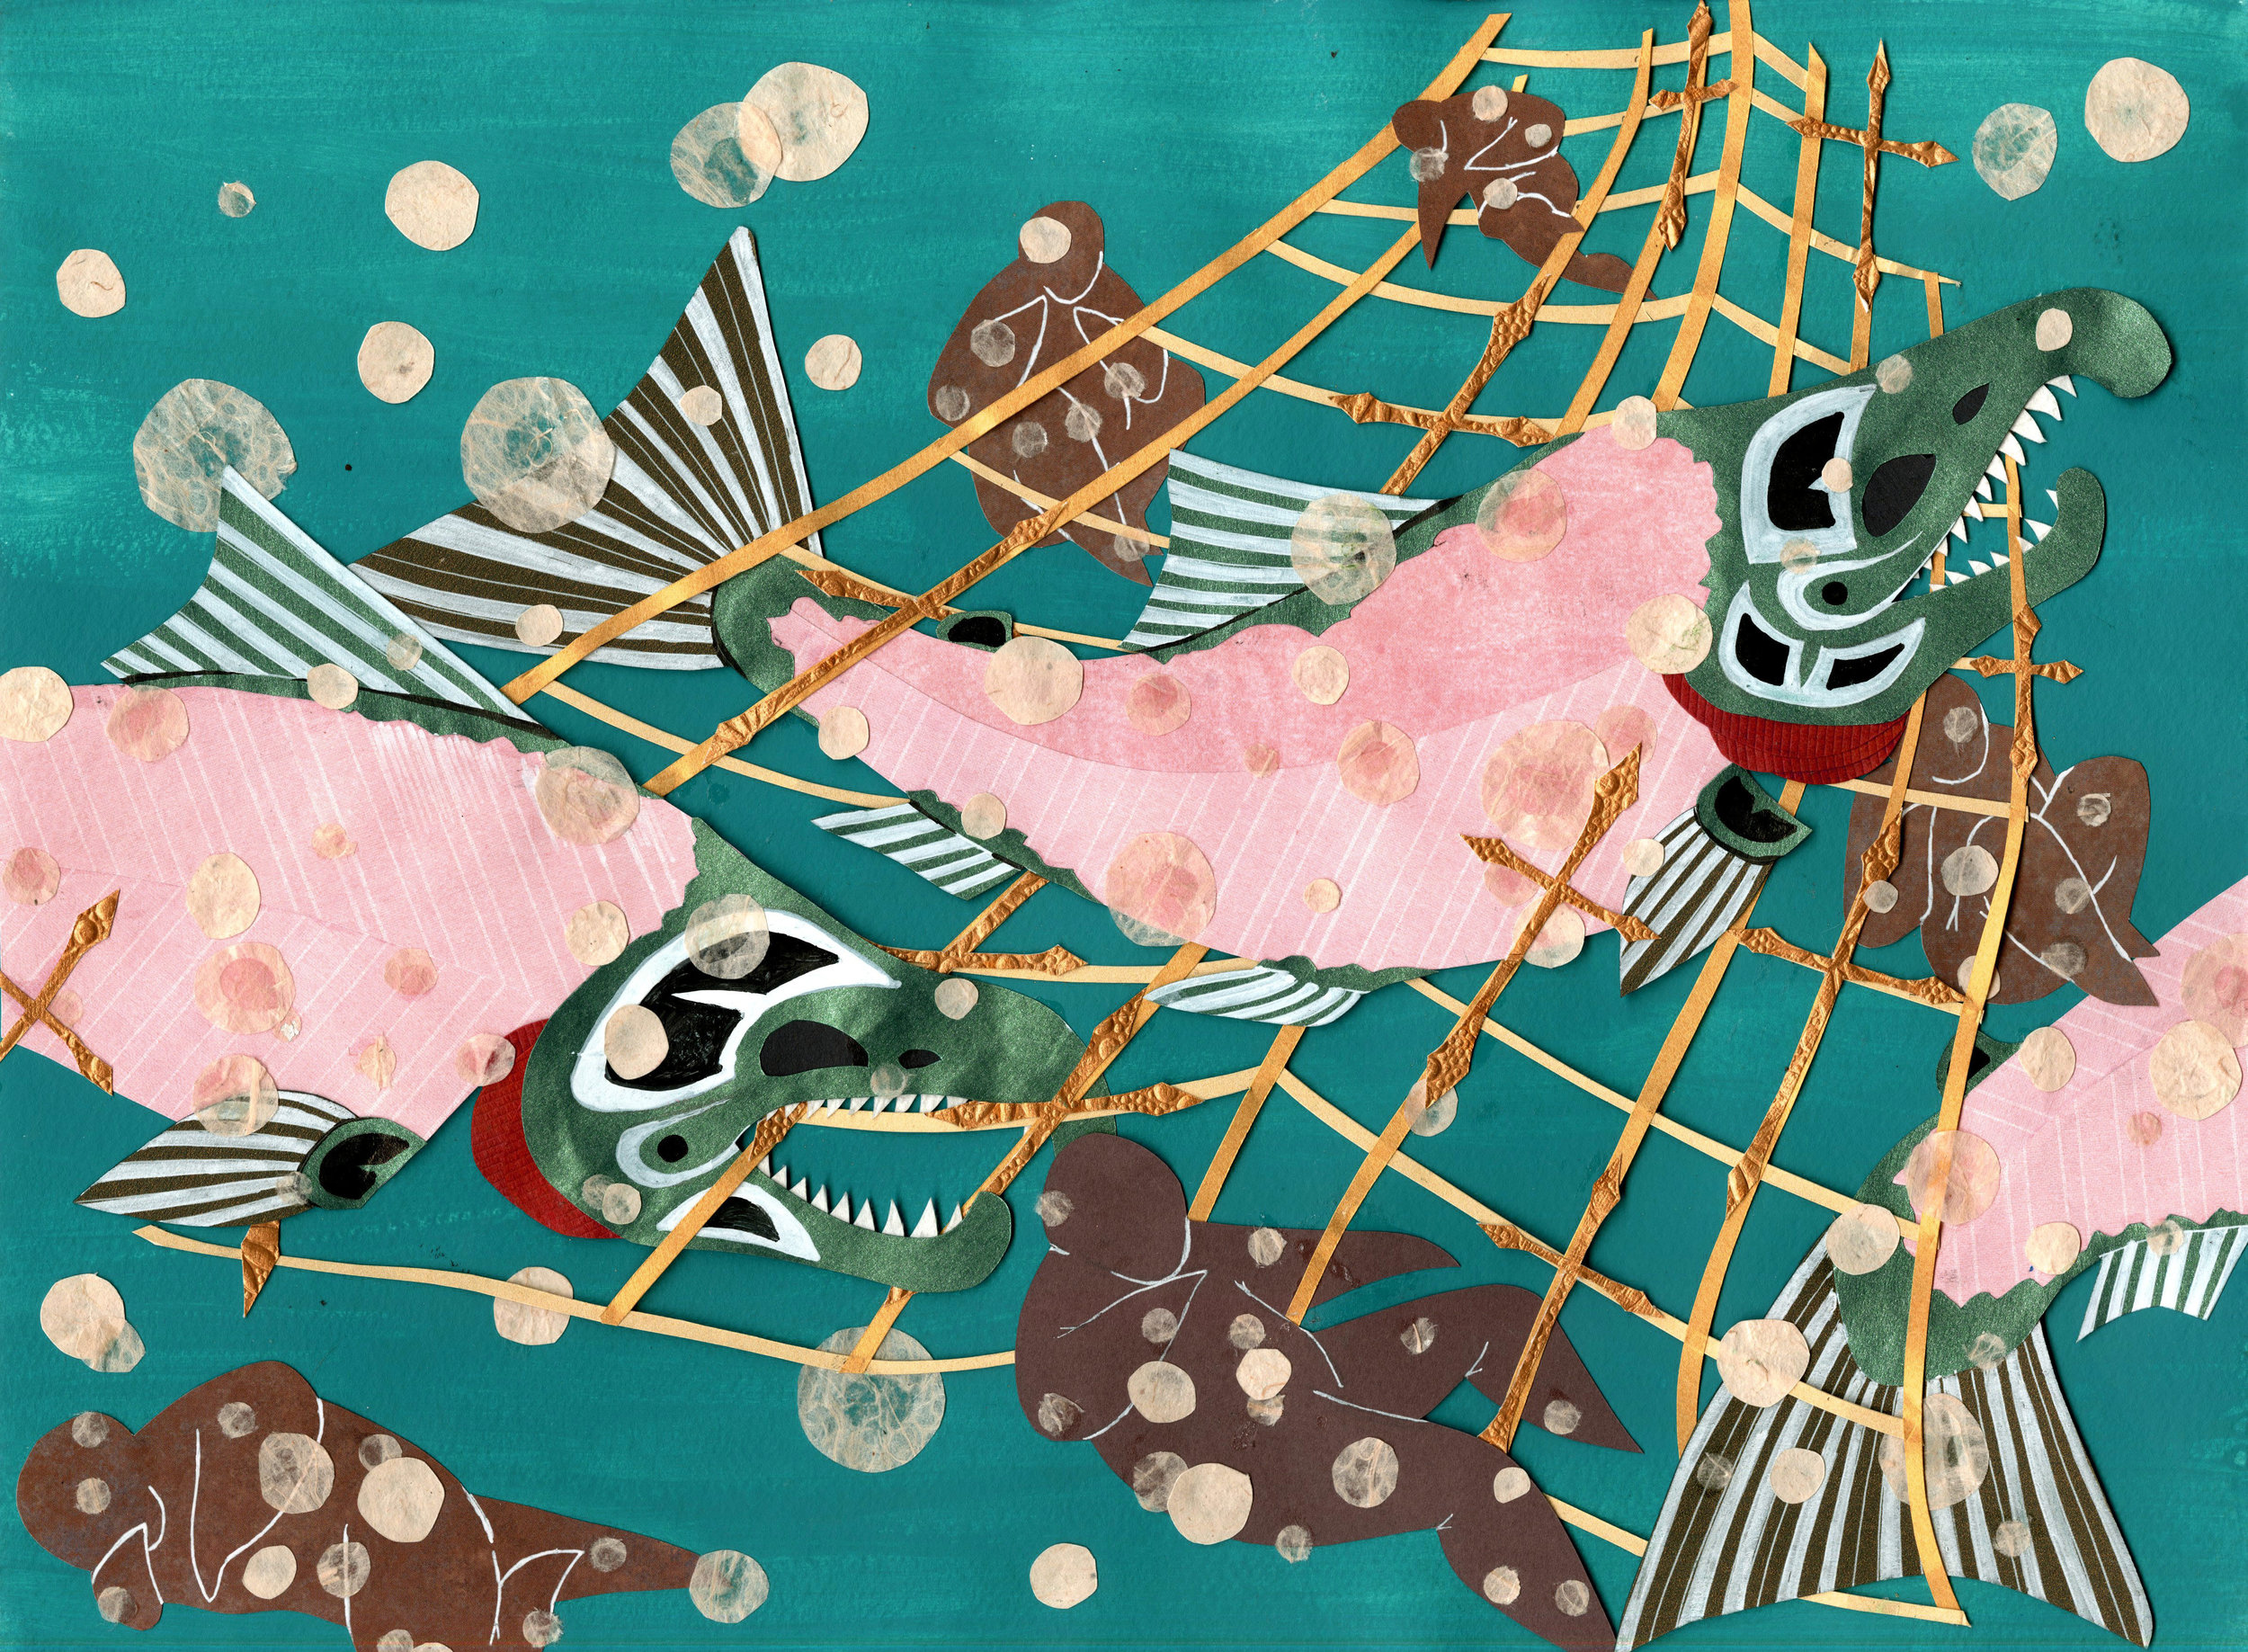 Tlingit salmon. paper-cut illustration.